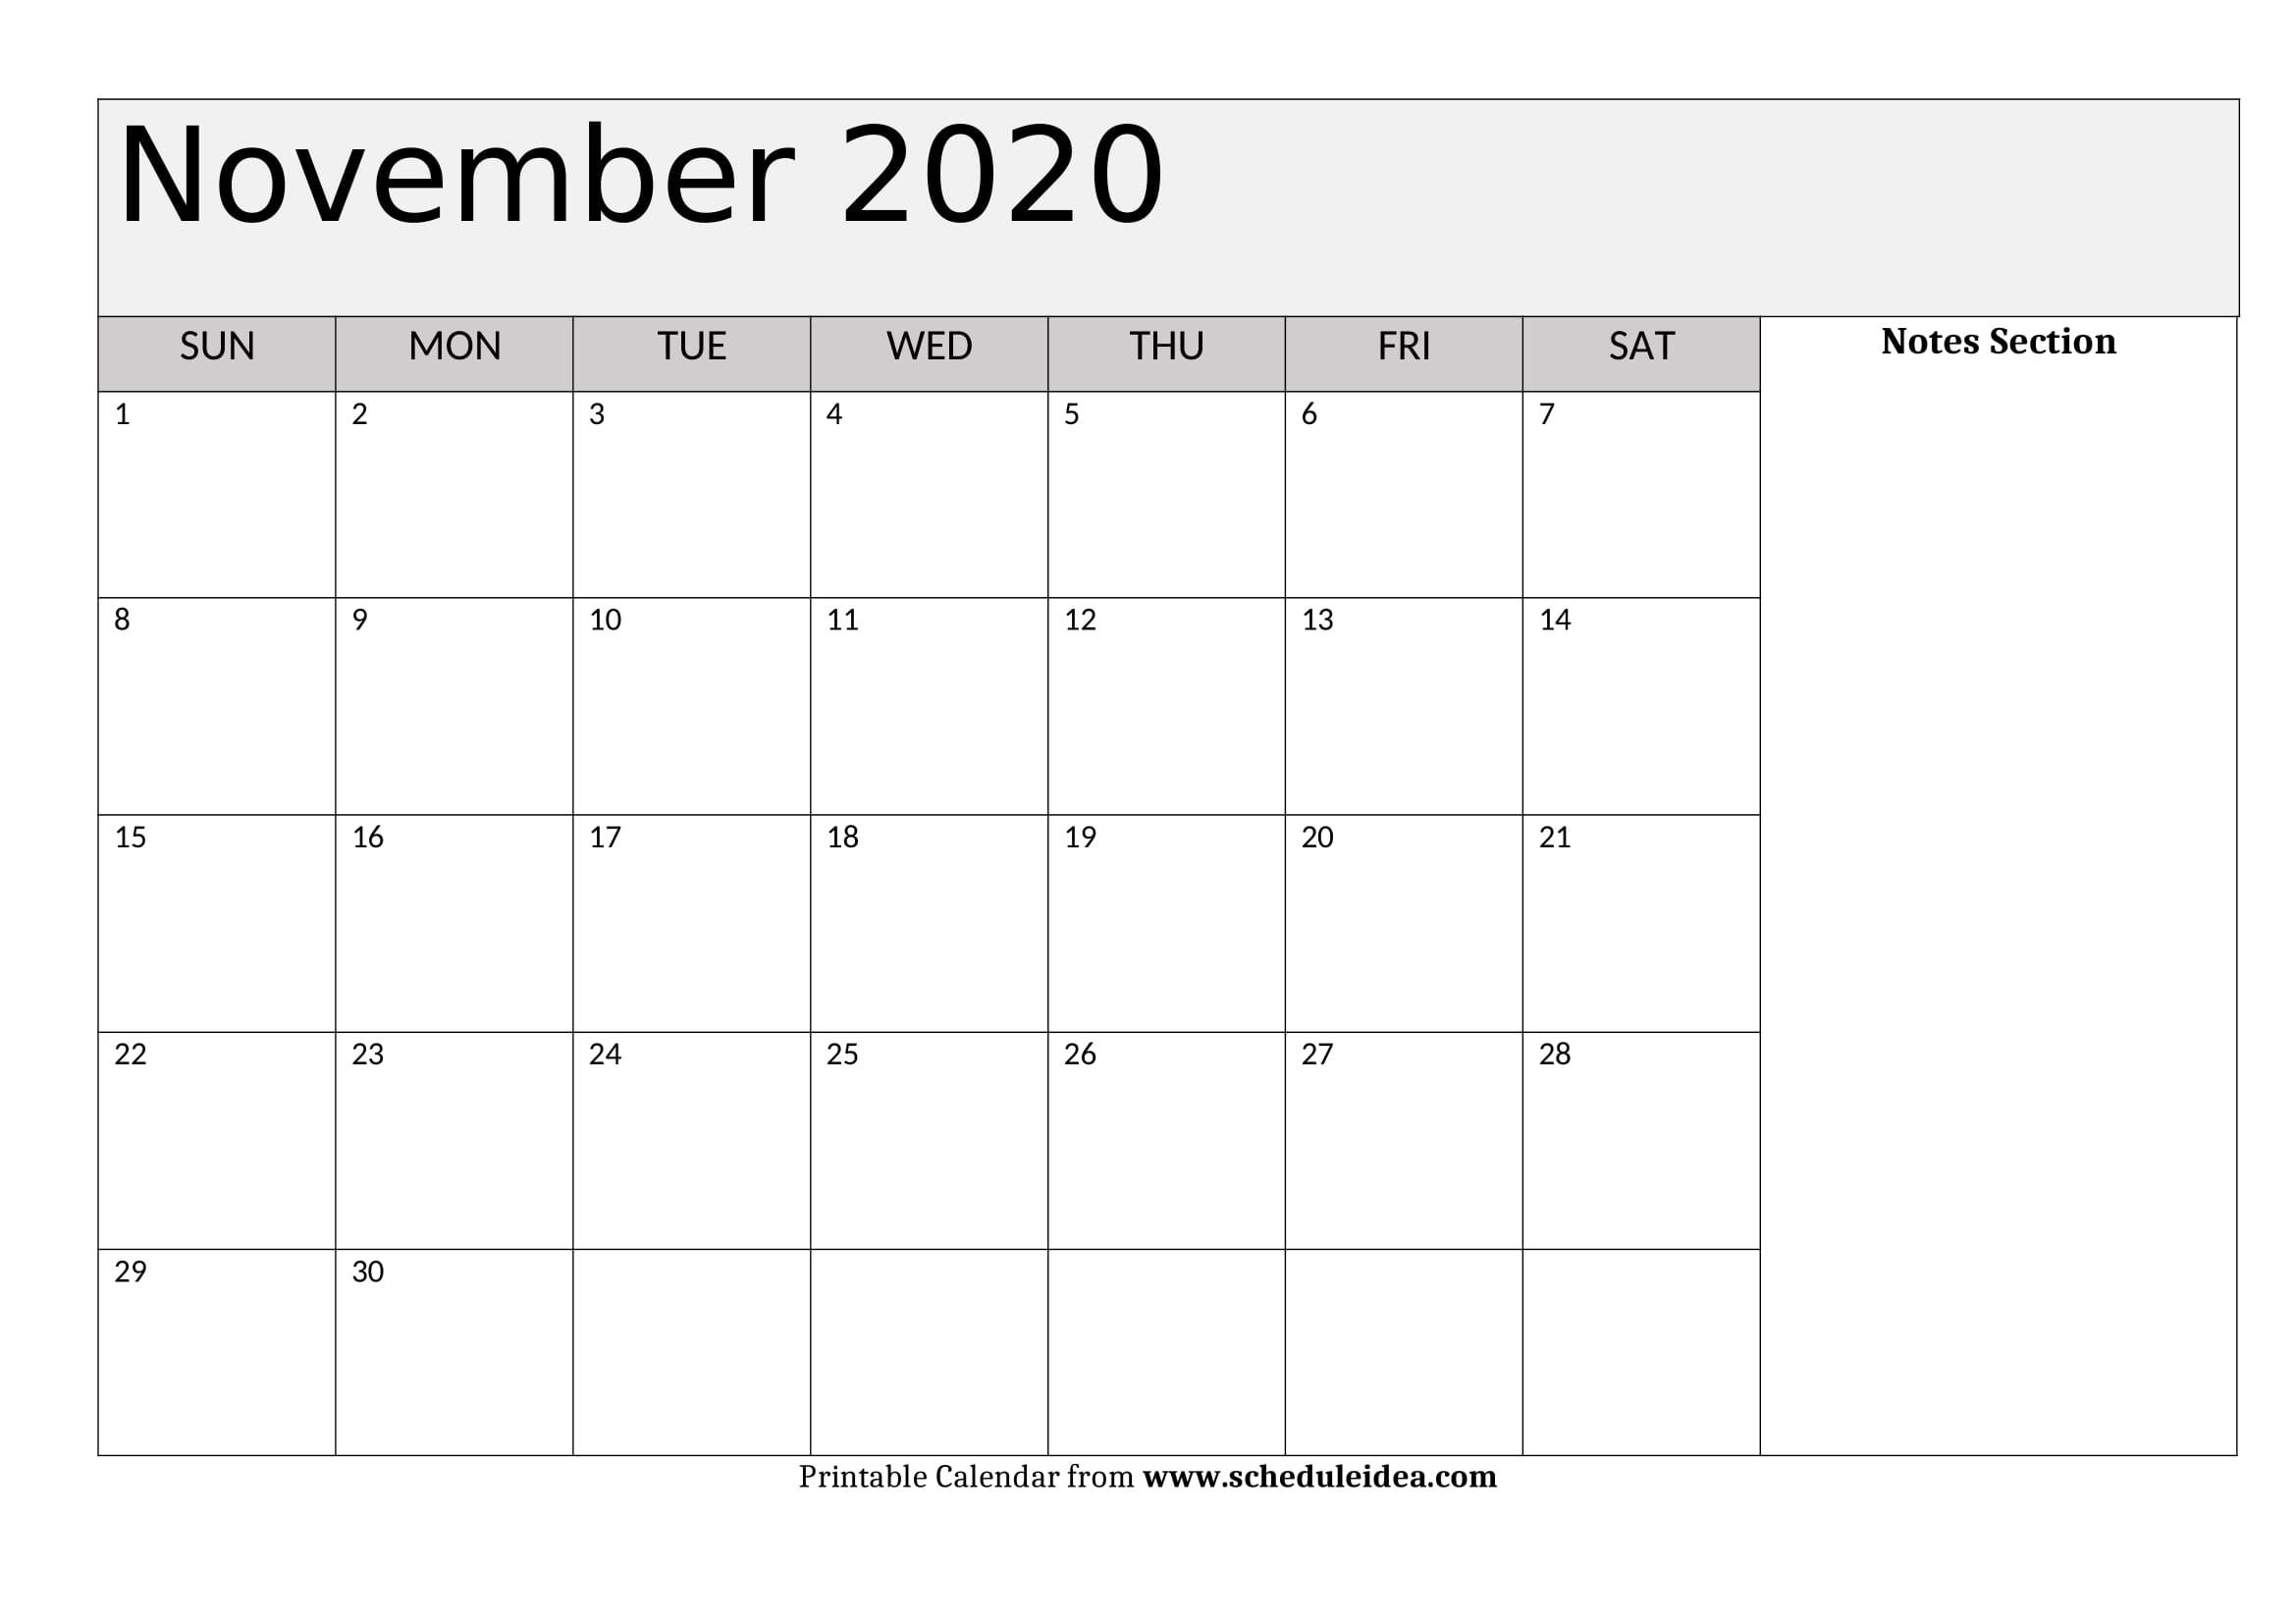 November 2020 Printable Calendar - Editable Templates (Pdf